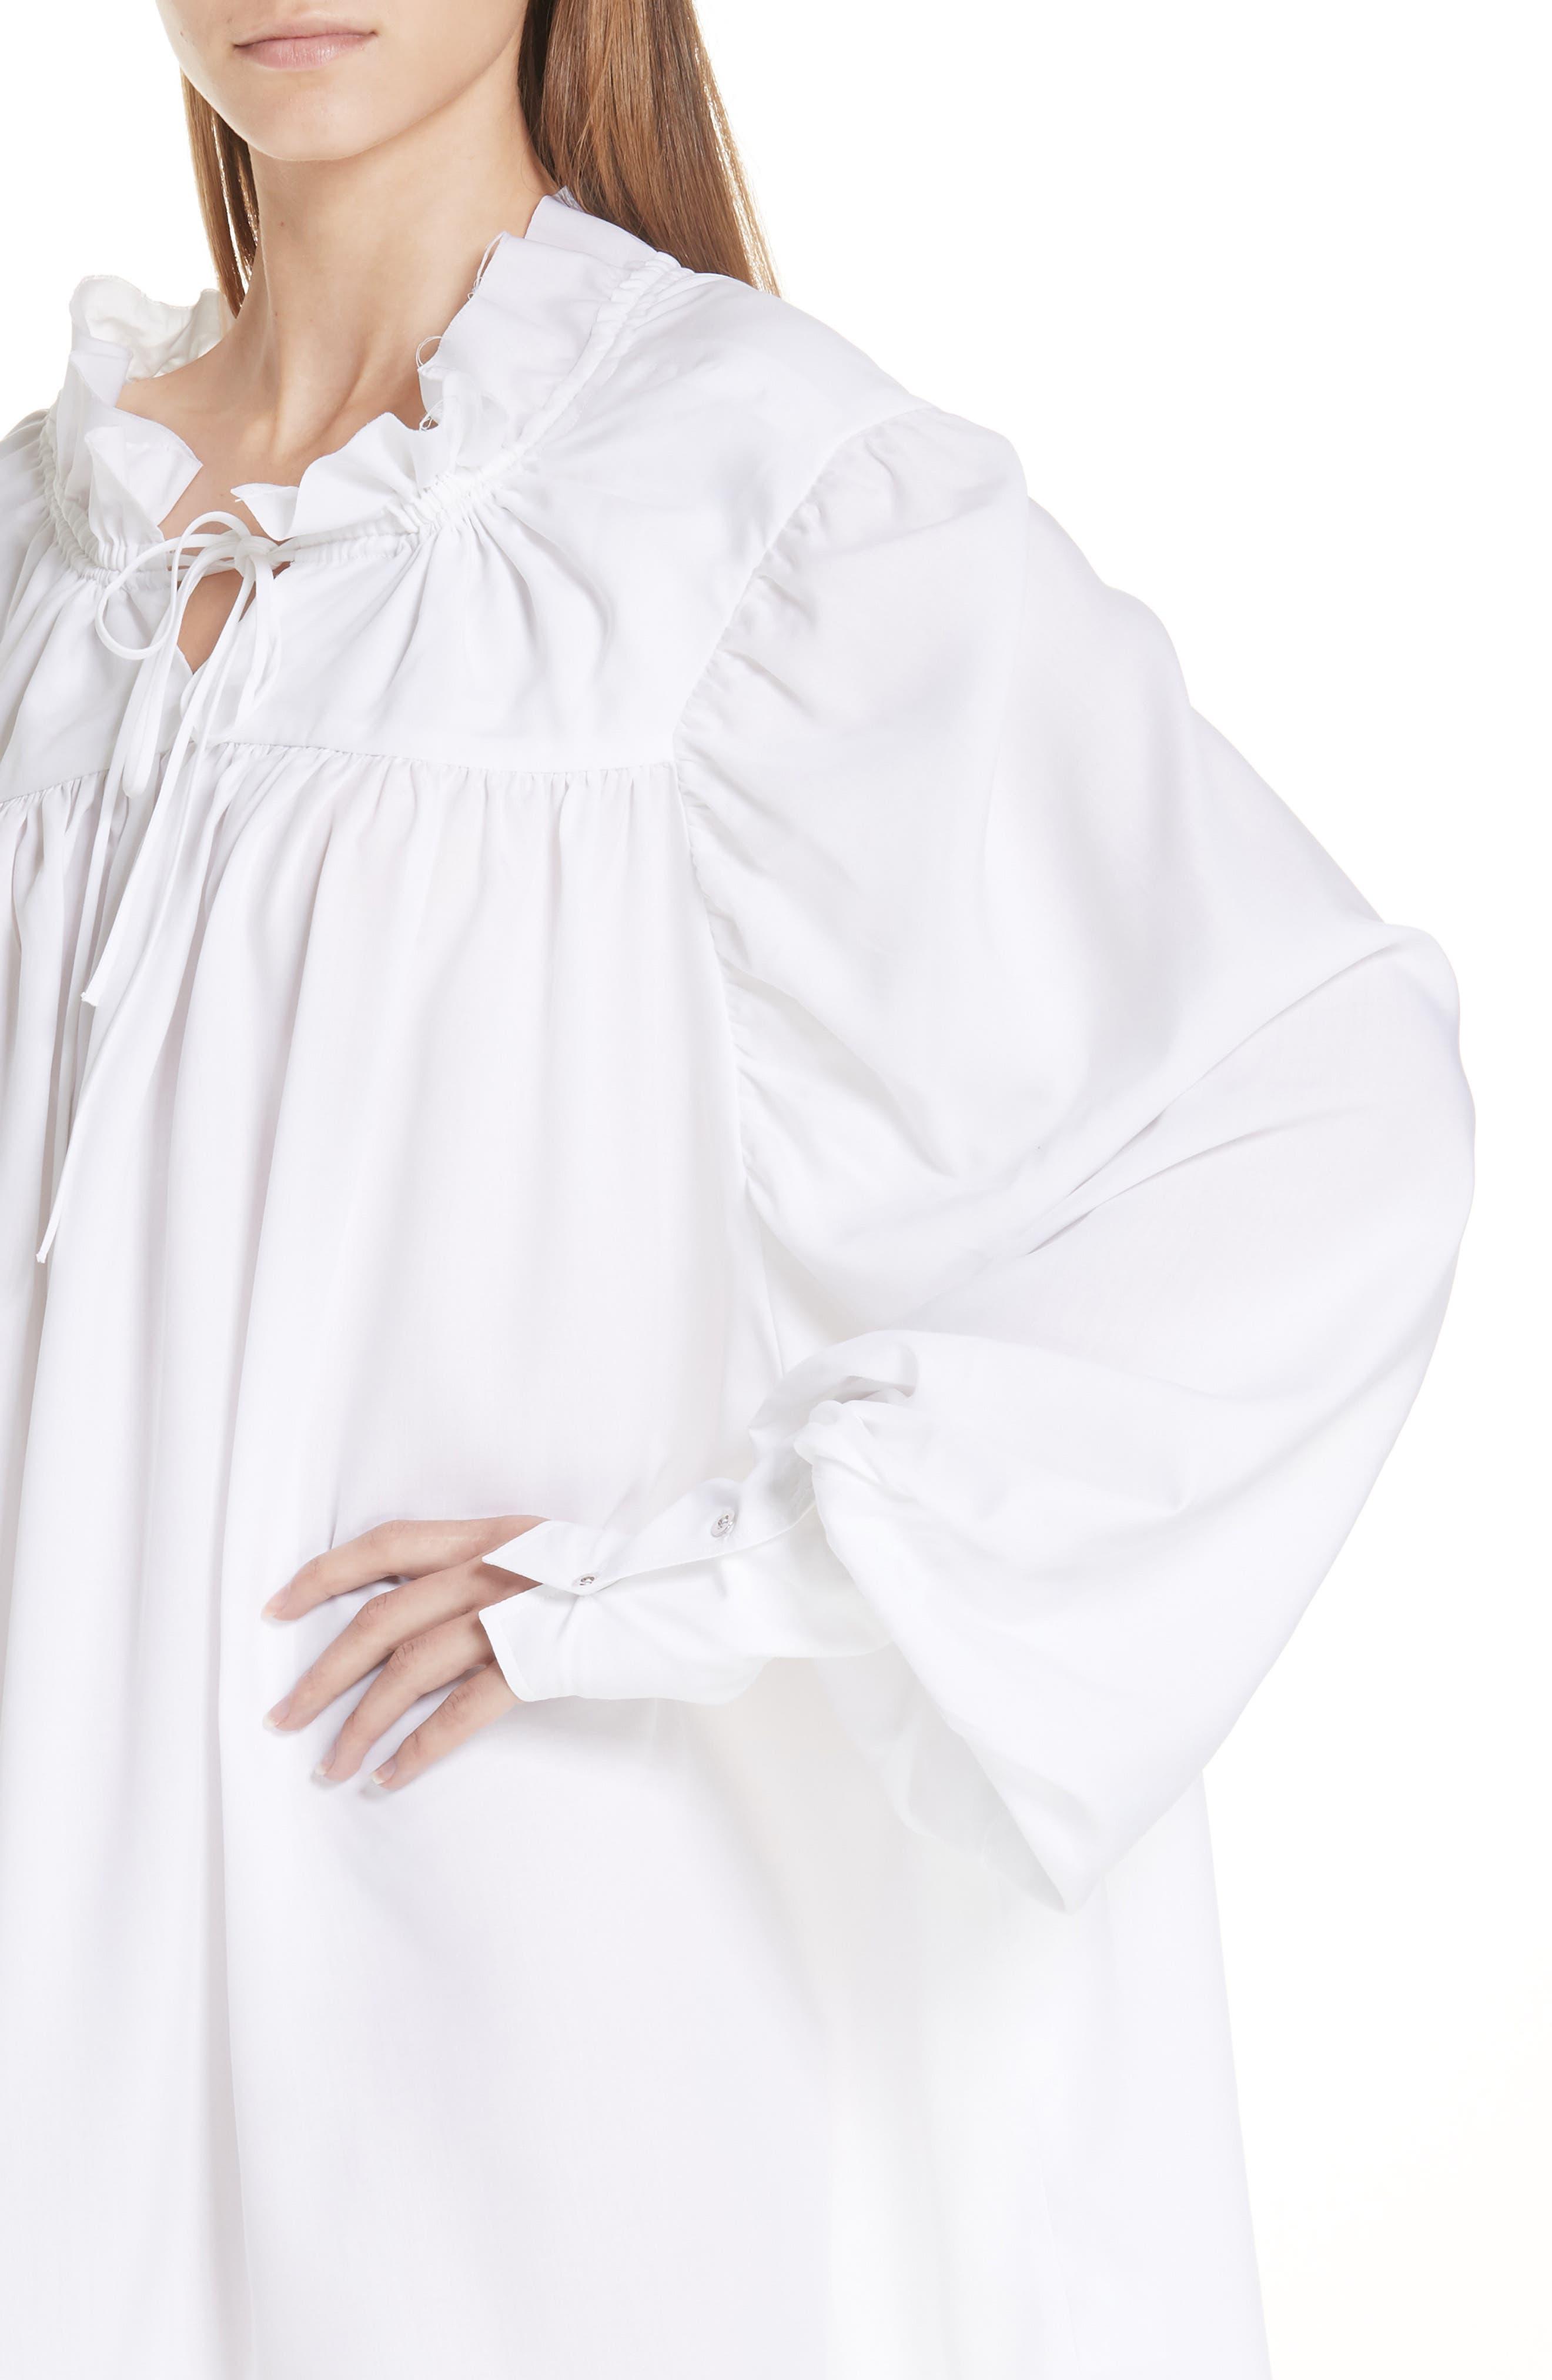 Marques'Almeida Gathered Yoke Shirt,                             Alternate thumbnail 4, color,                             WHITE